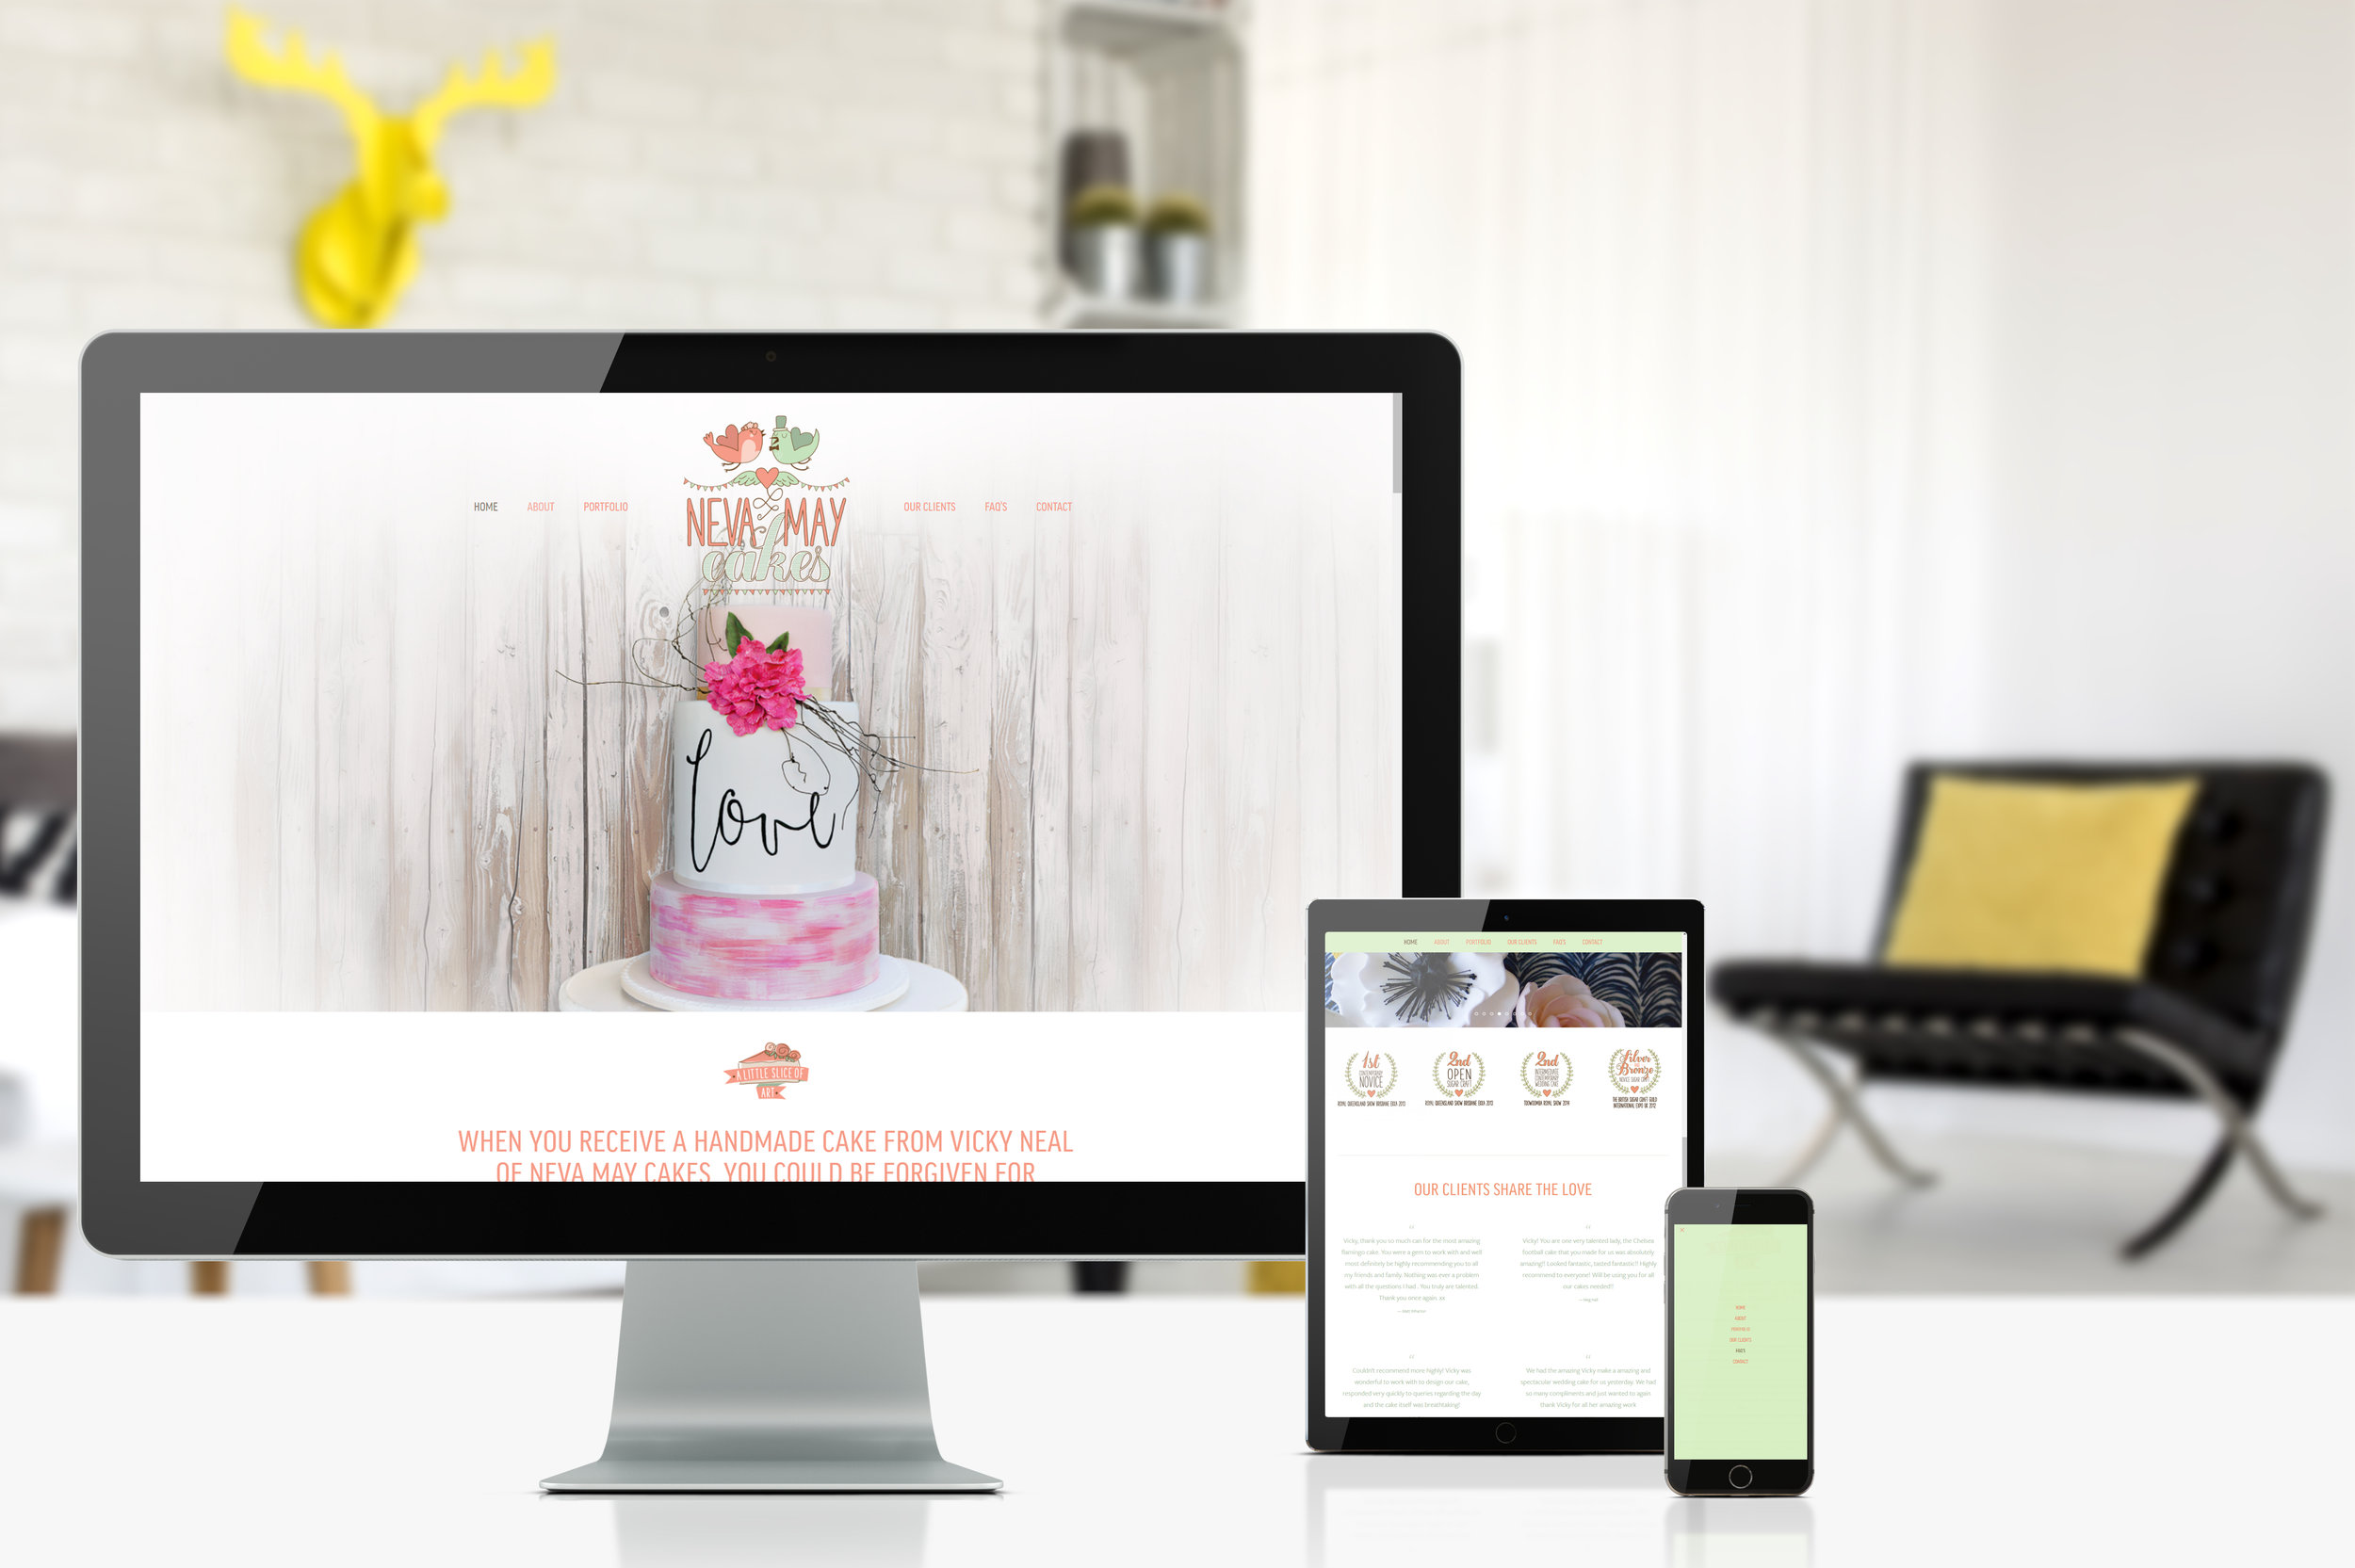 neva may cakes<br><strong>Web Design</strong>